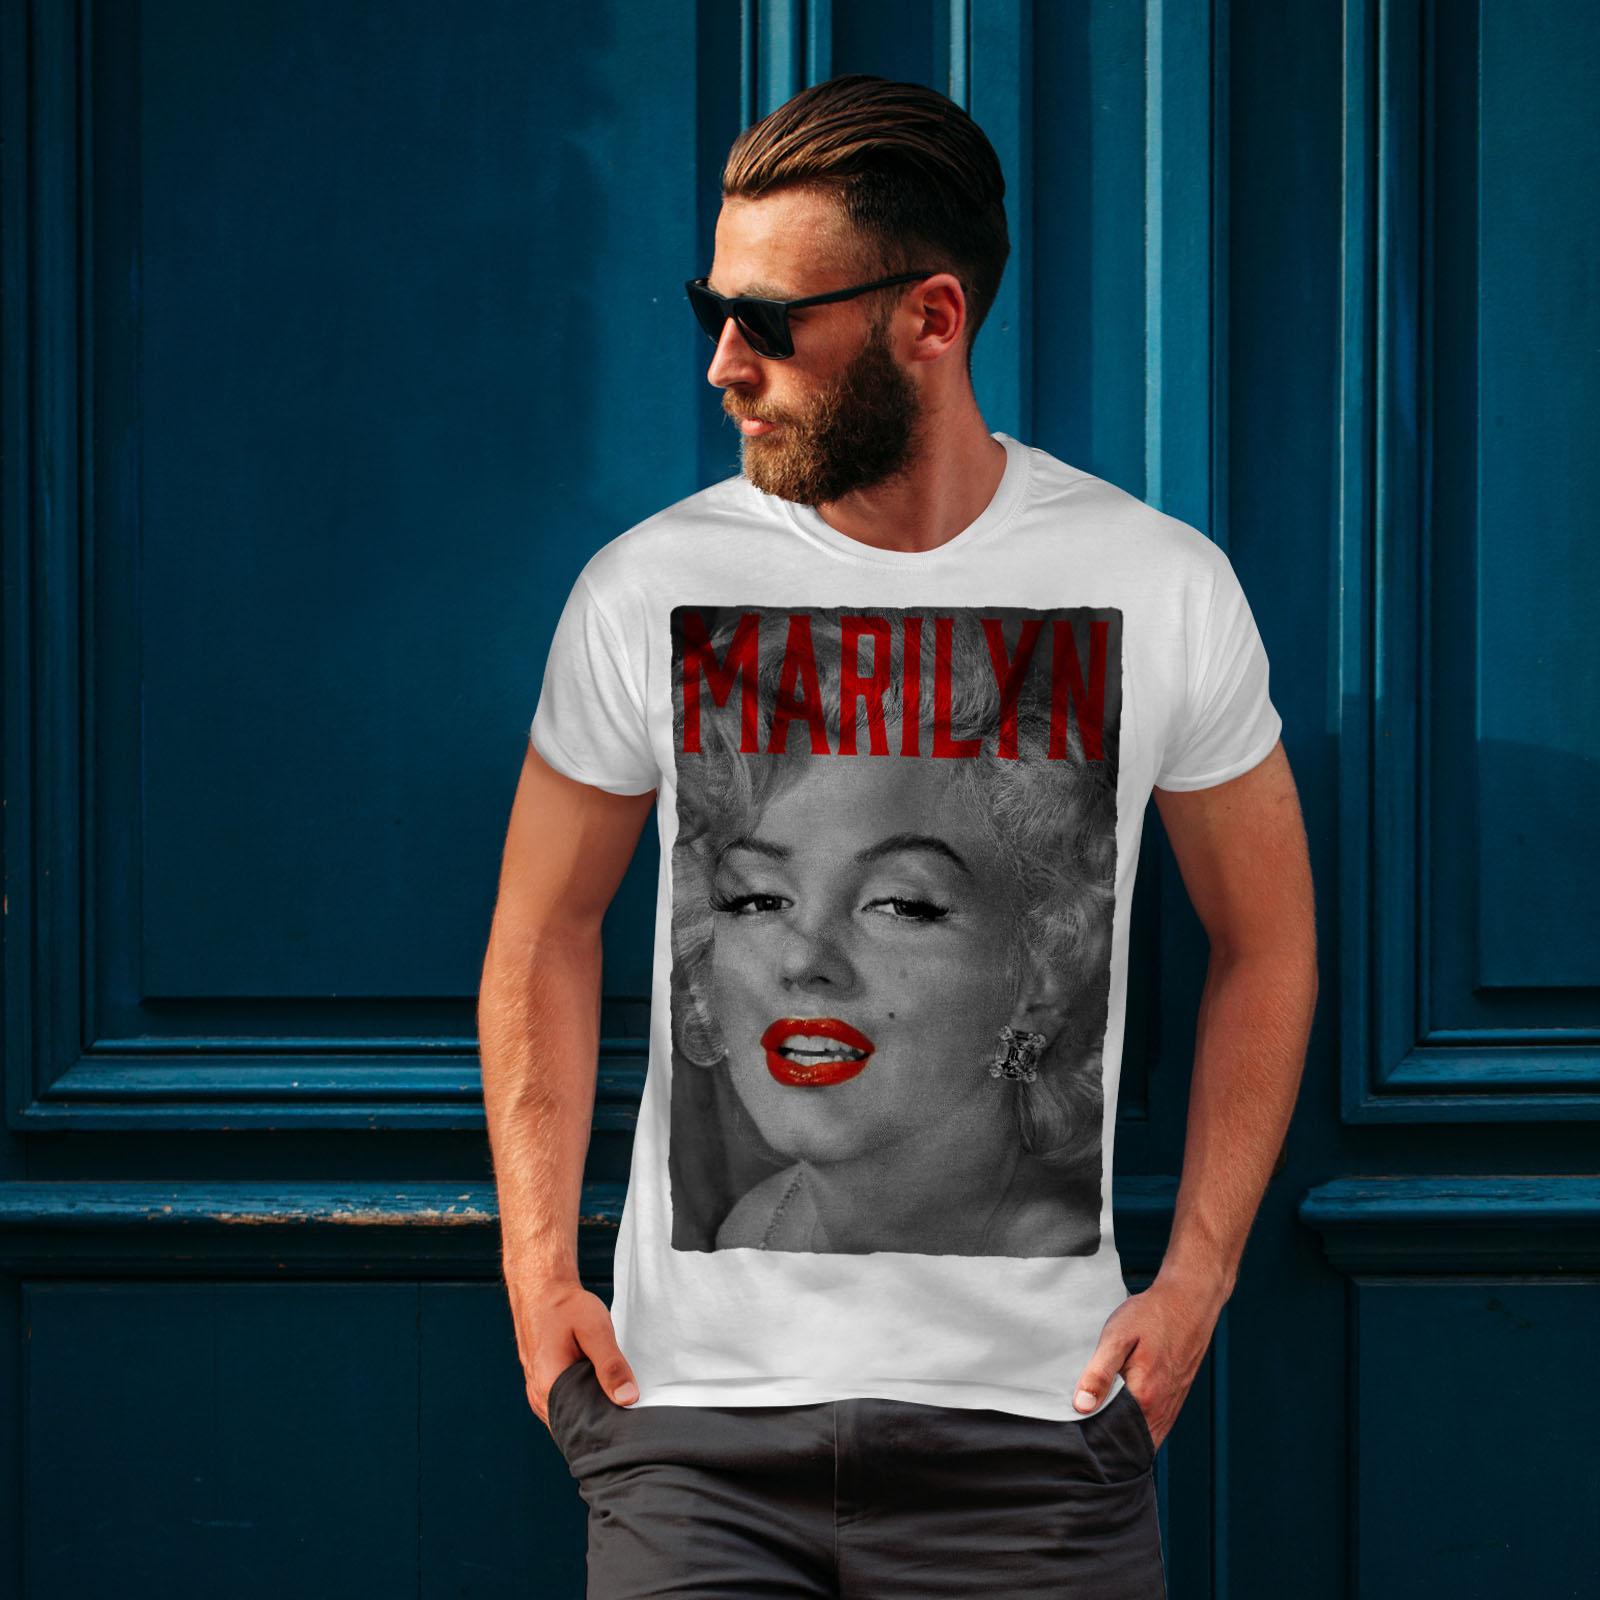 Wellcoda-Marilyn-Retro-Photo-Mens-T-shirt-Urban-Graphic-Design-Printed-Tee thumbnail 10